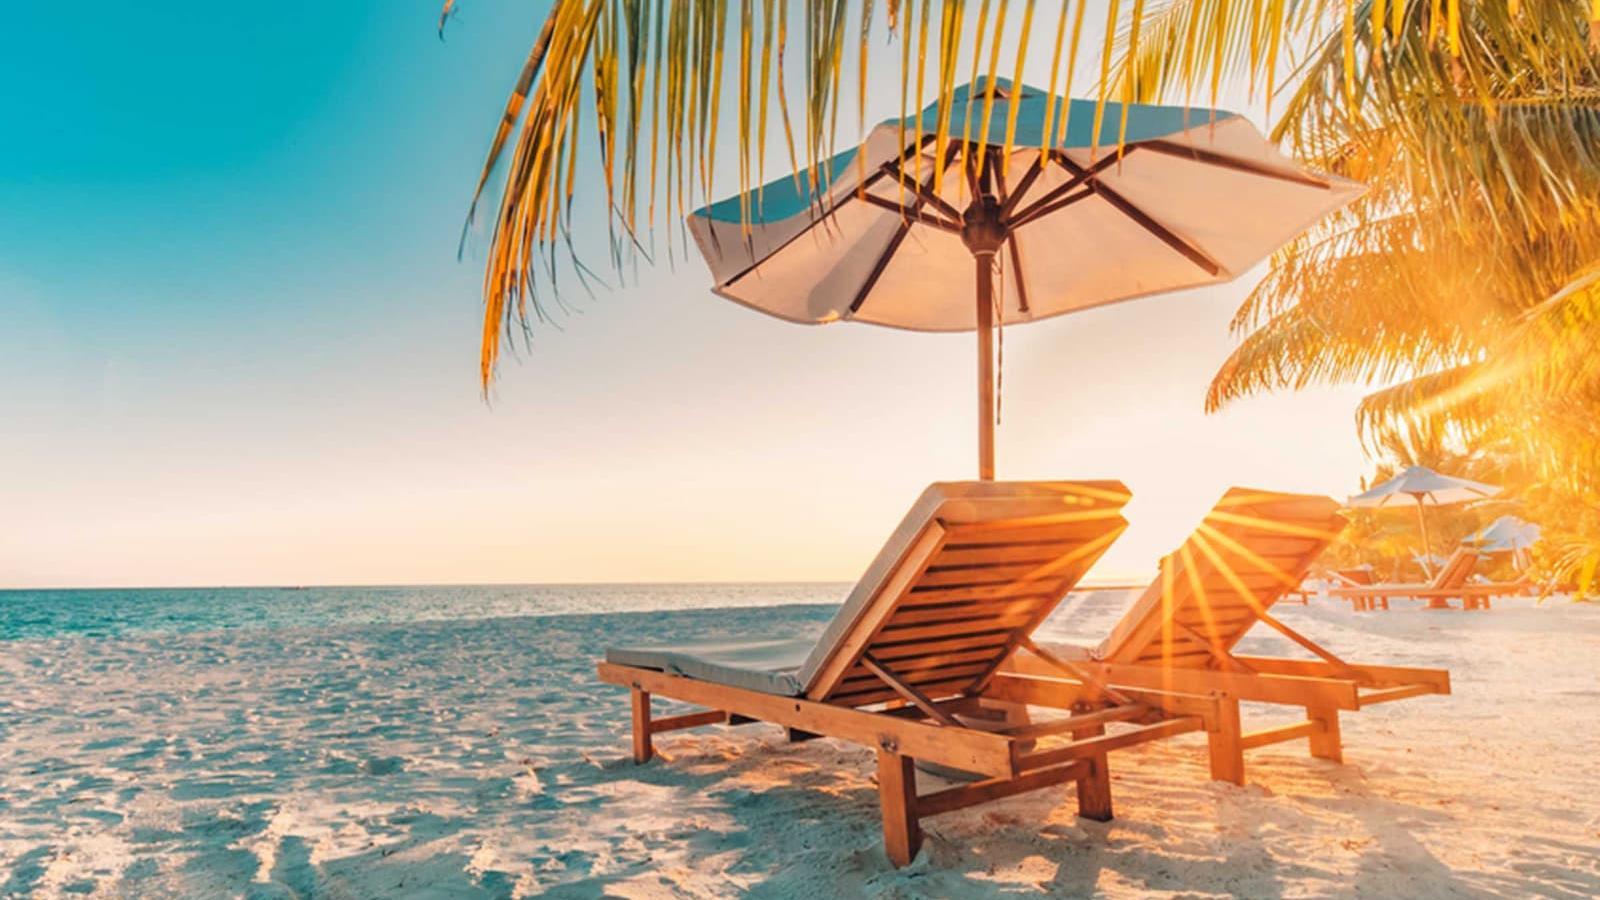 How to enjoy summer in Qatar